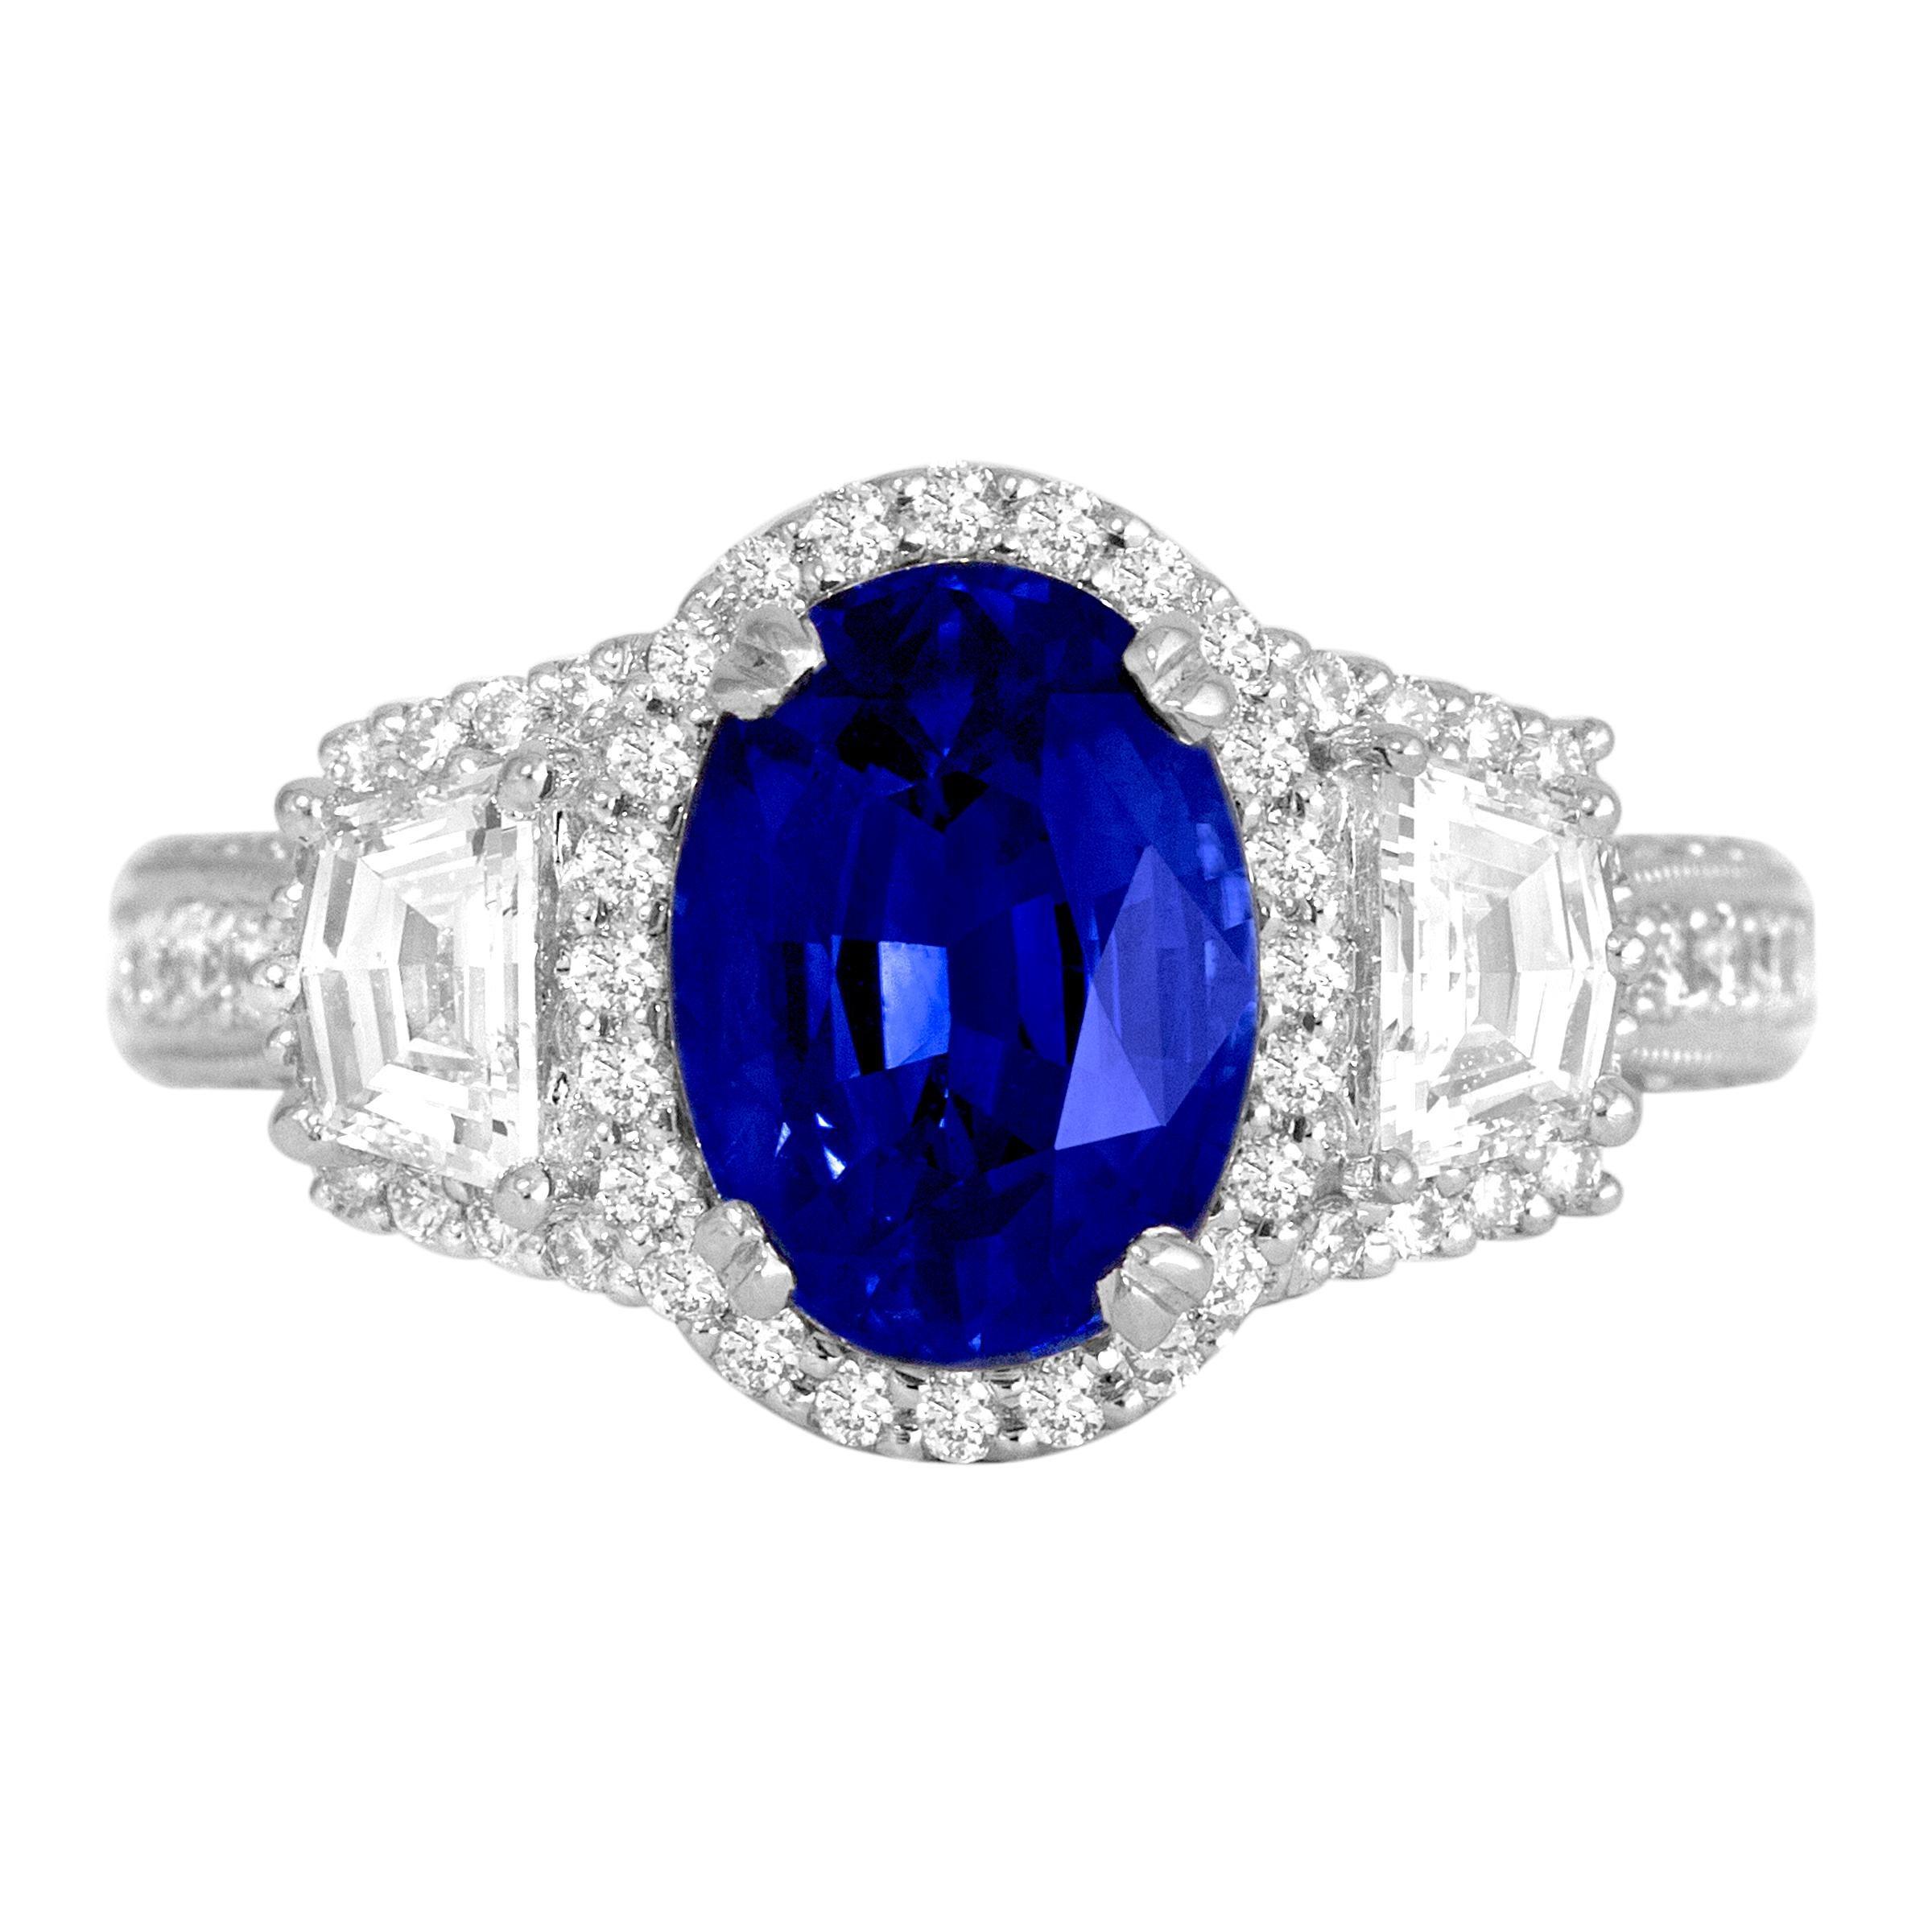 DiamondTown 2.97 Carat Oval Cut Ceylon Sapphire and Diamond Ring